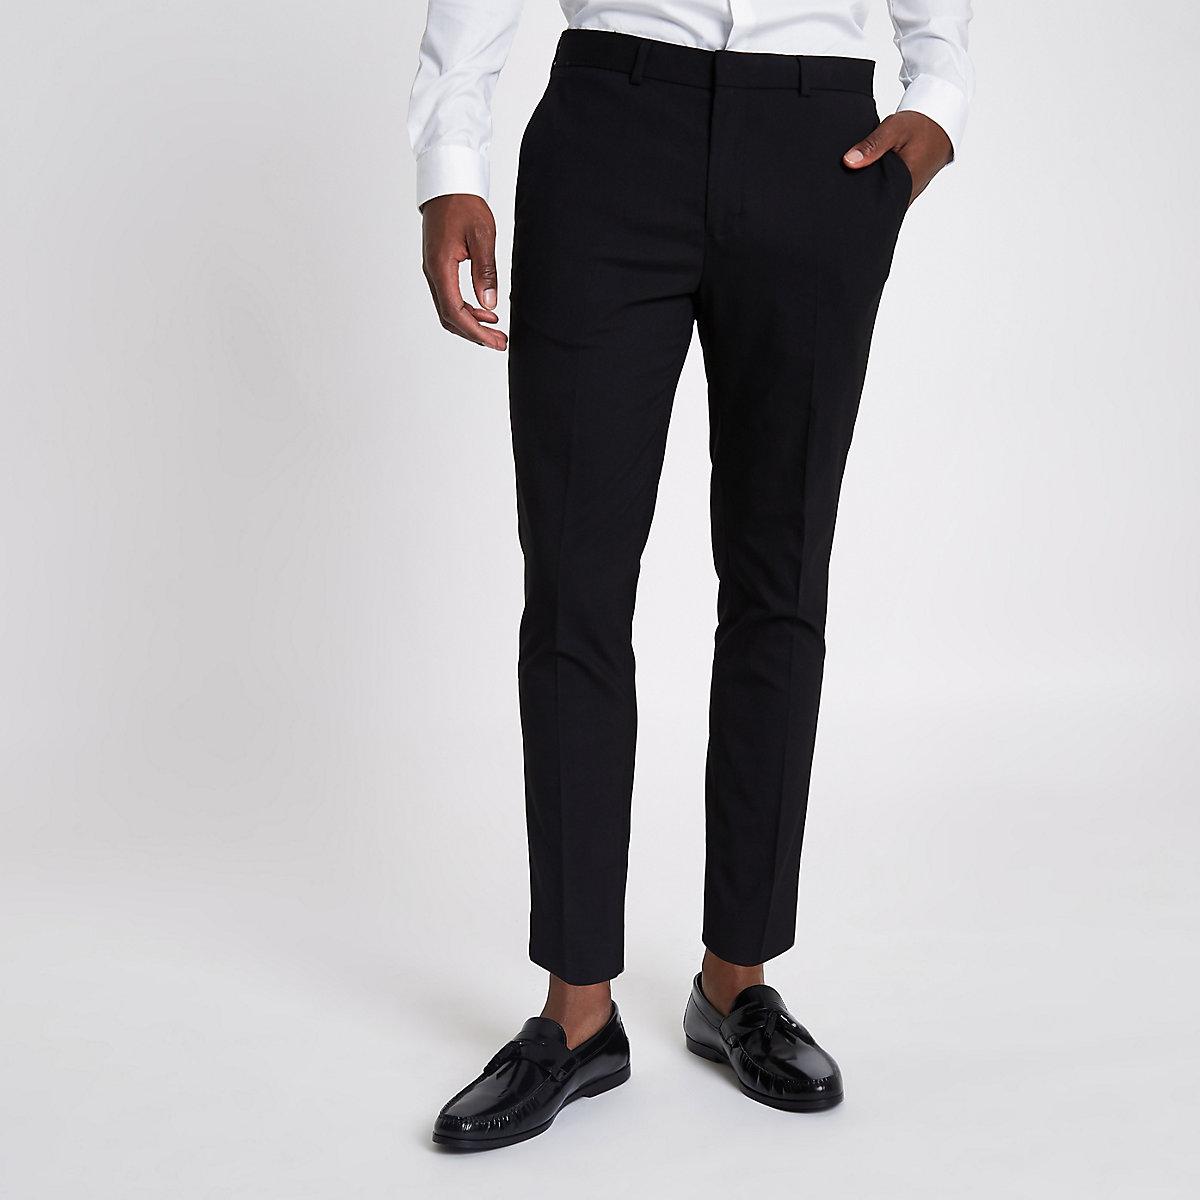 Schwarze, elegante Hose in schmaler Passform